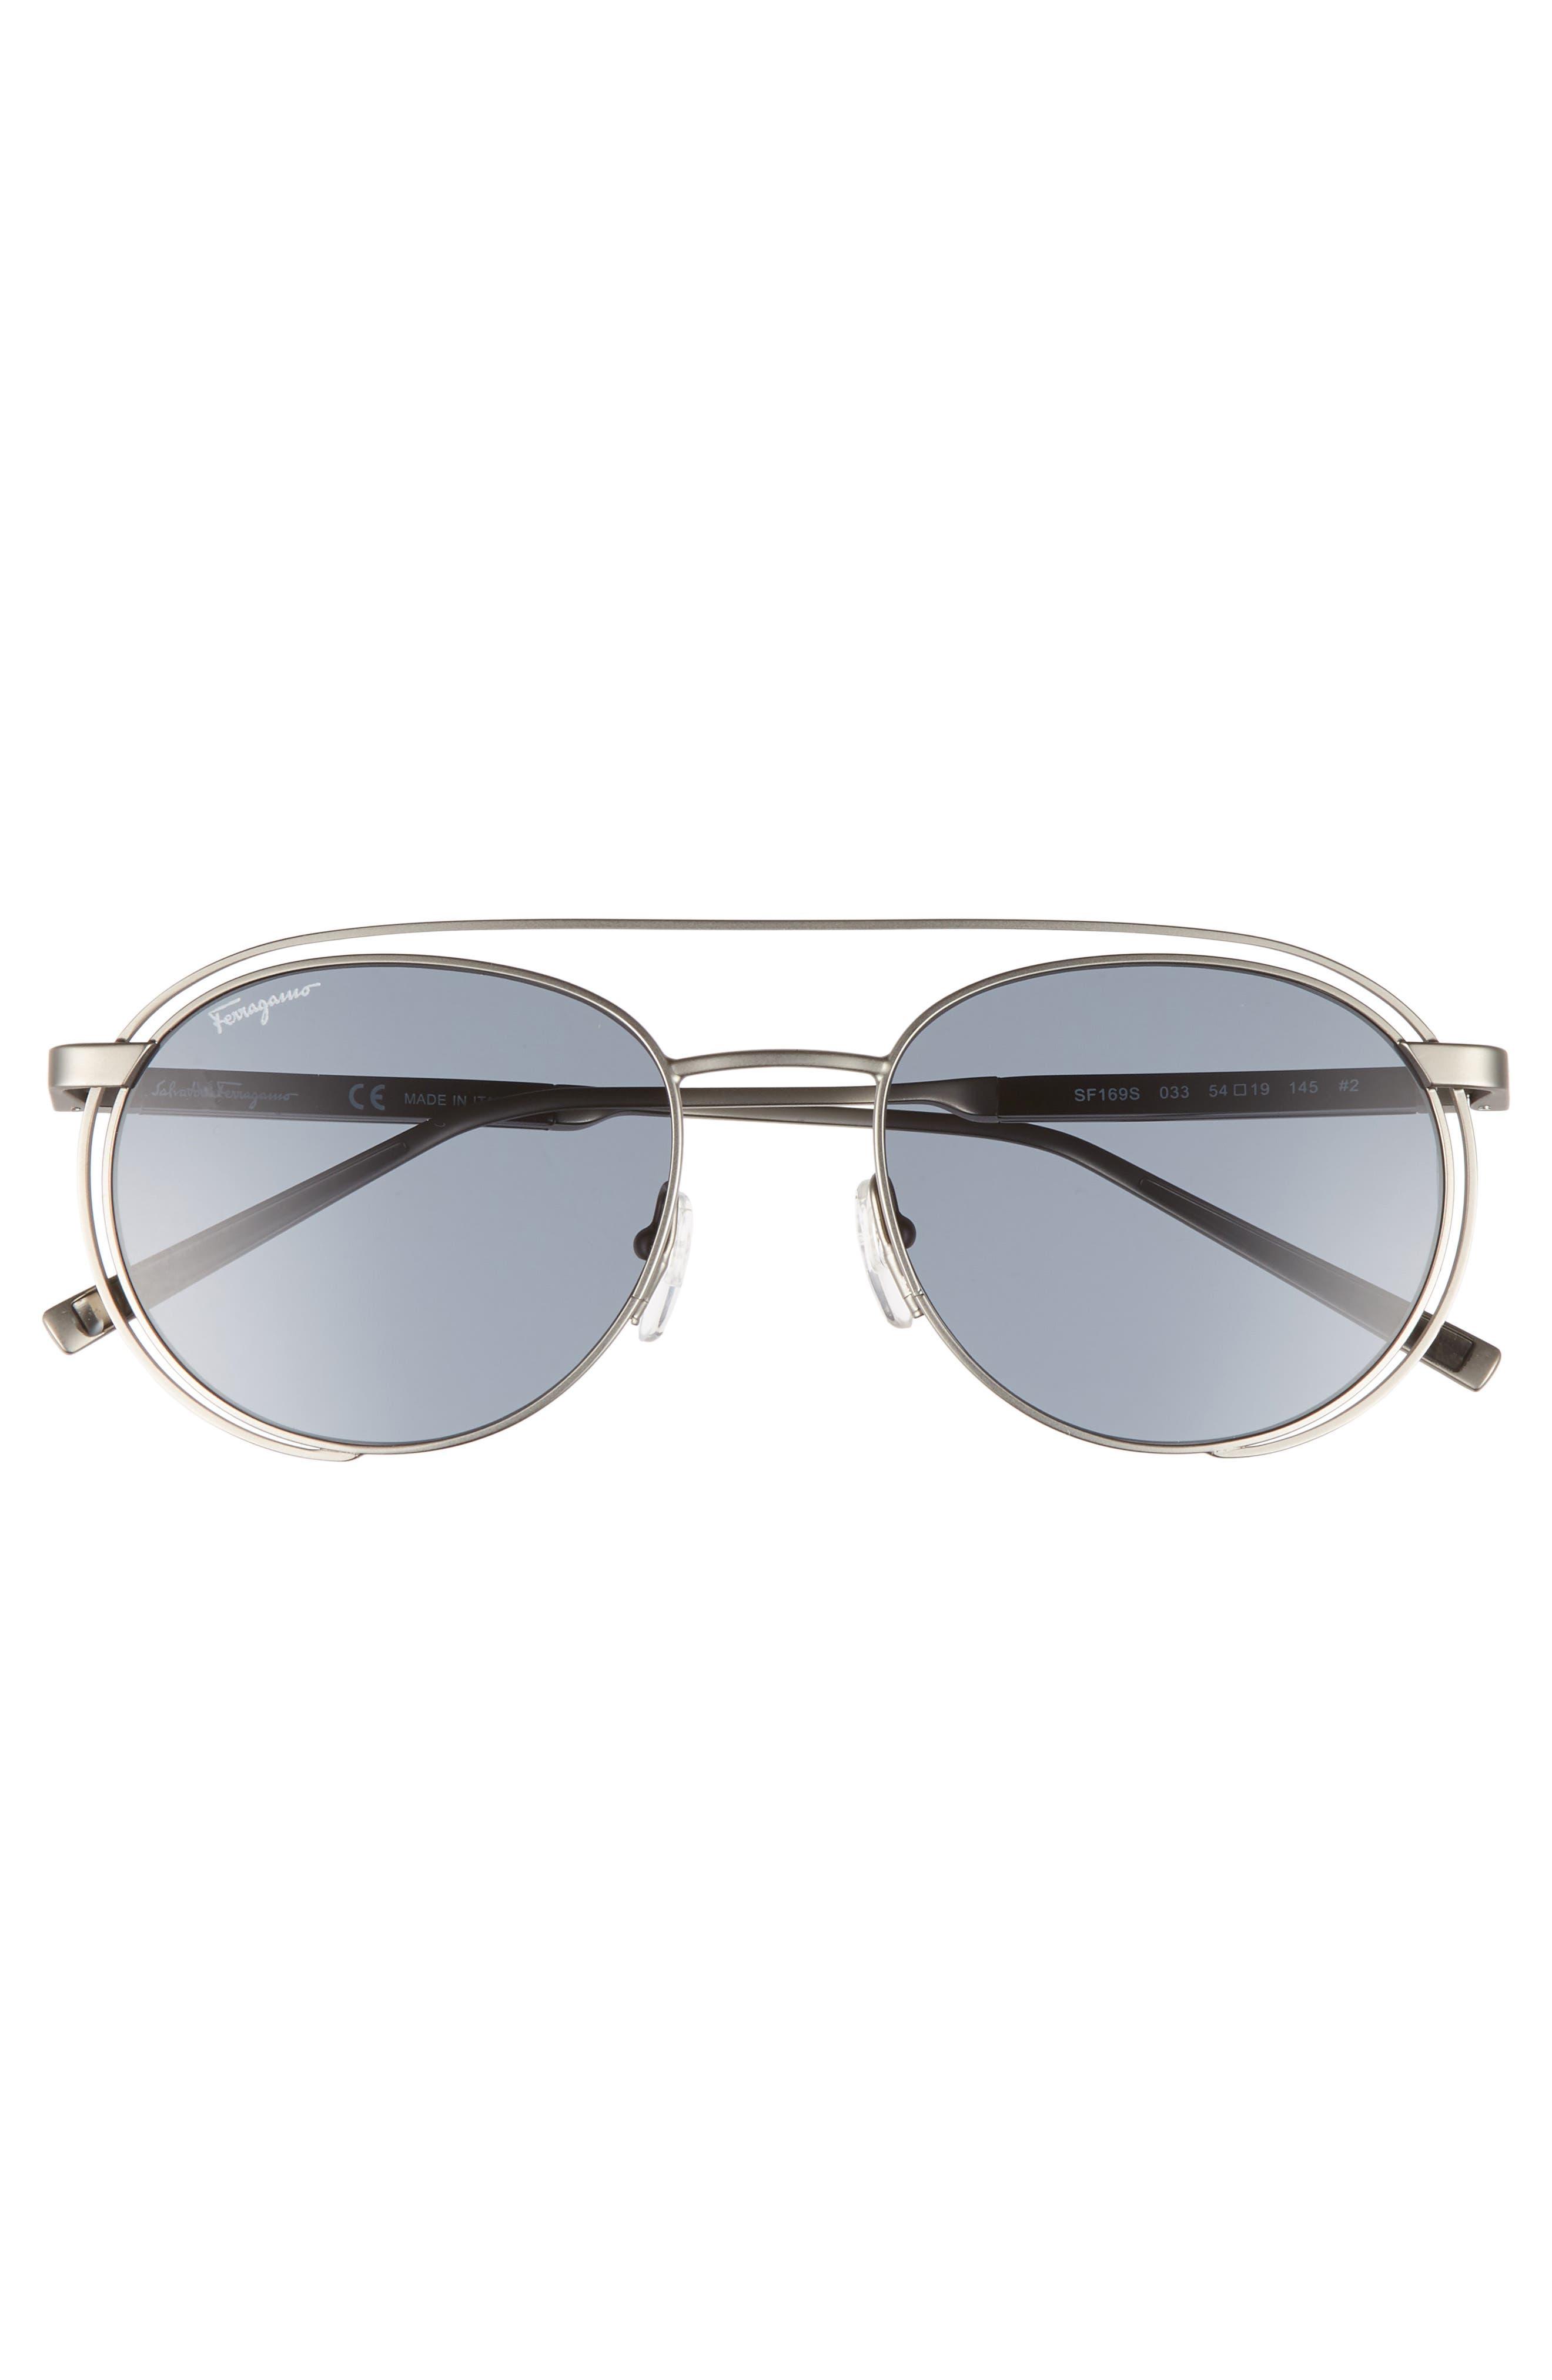 54mm Round Sunglasses,                             Alternate thumbnail 2, color,                             Matte Gunmetal